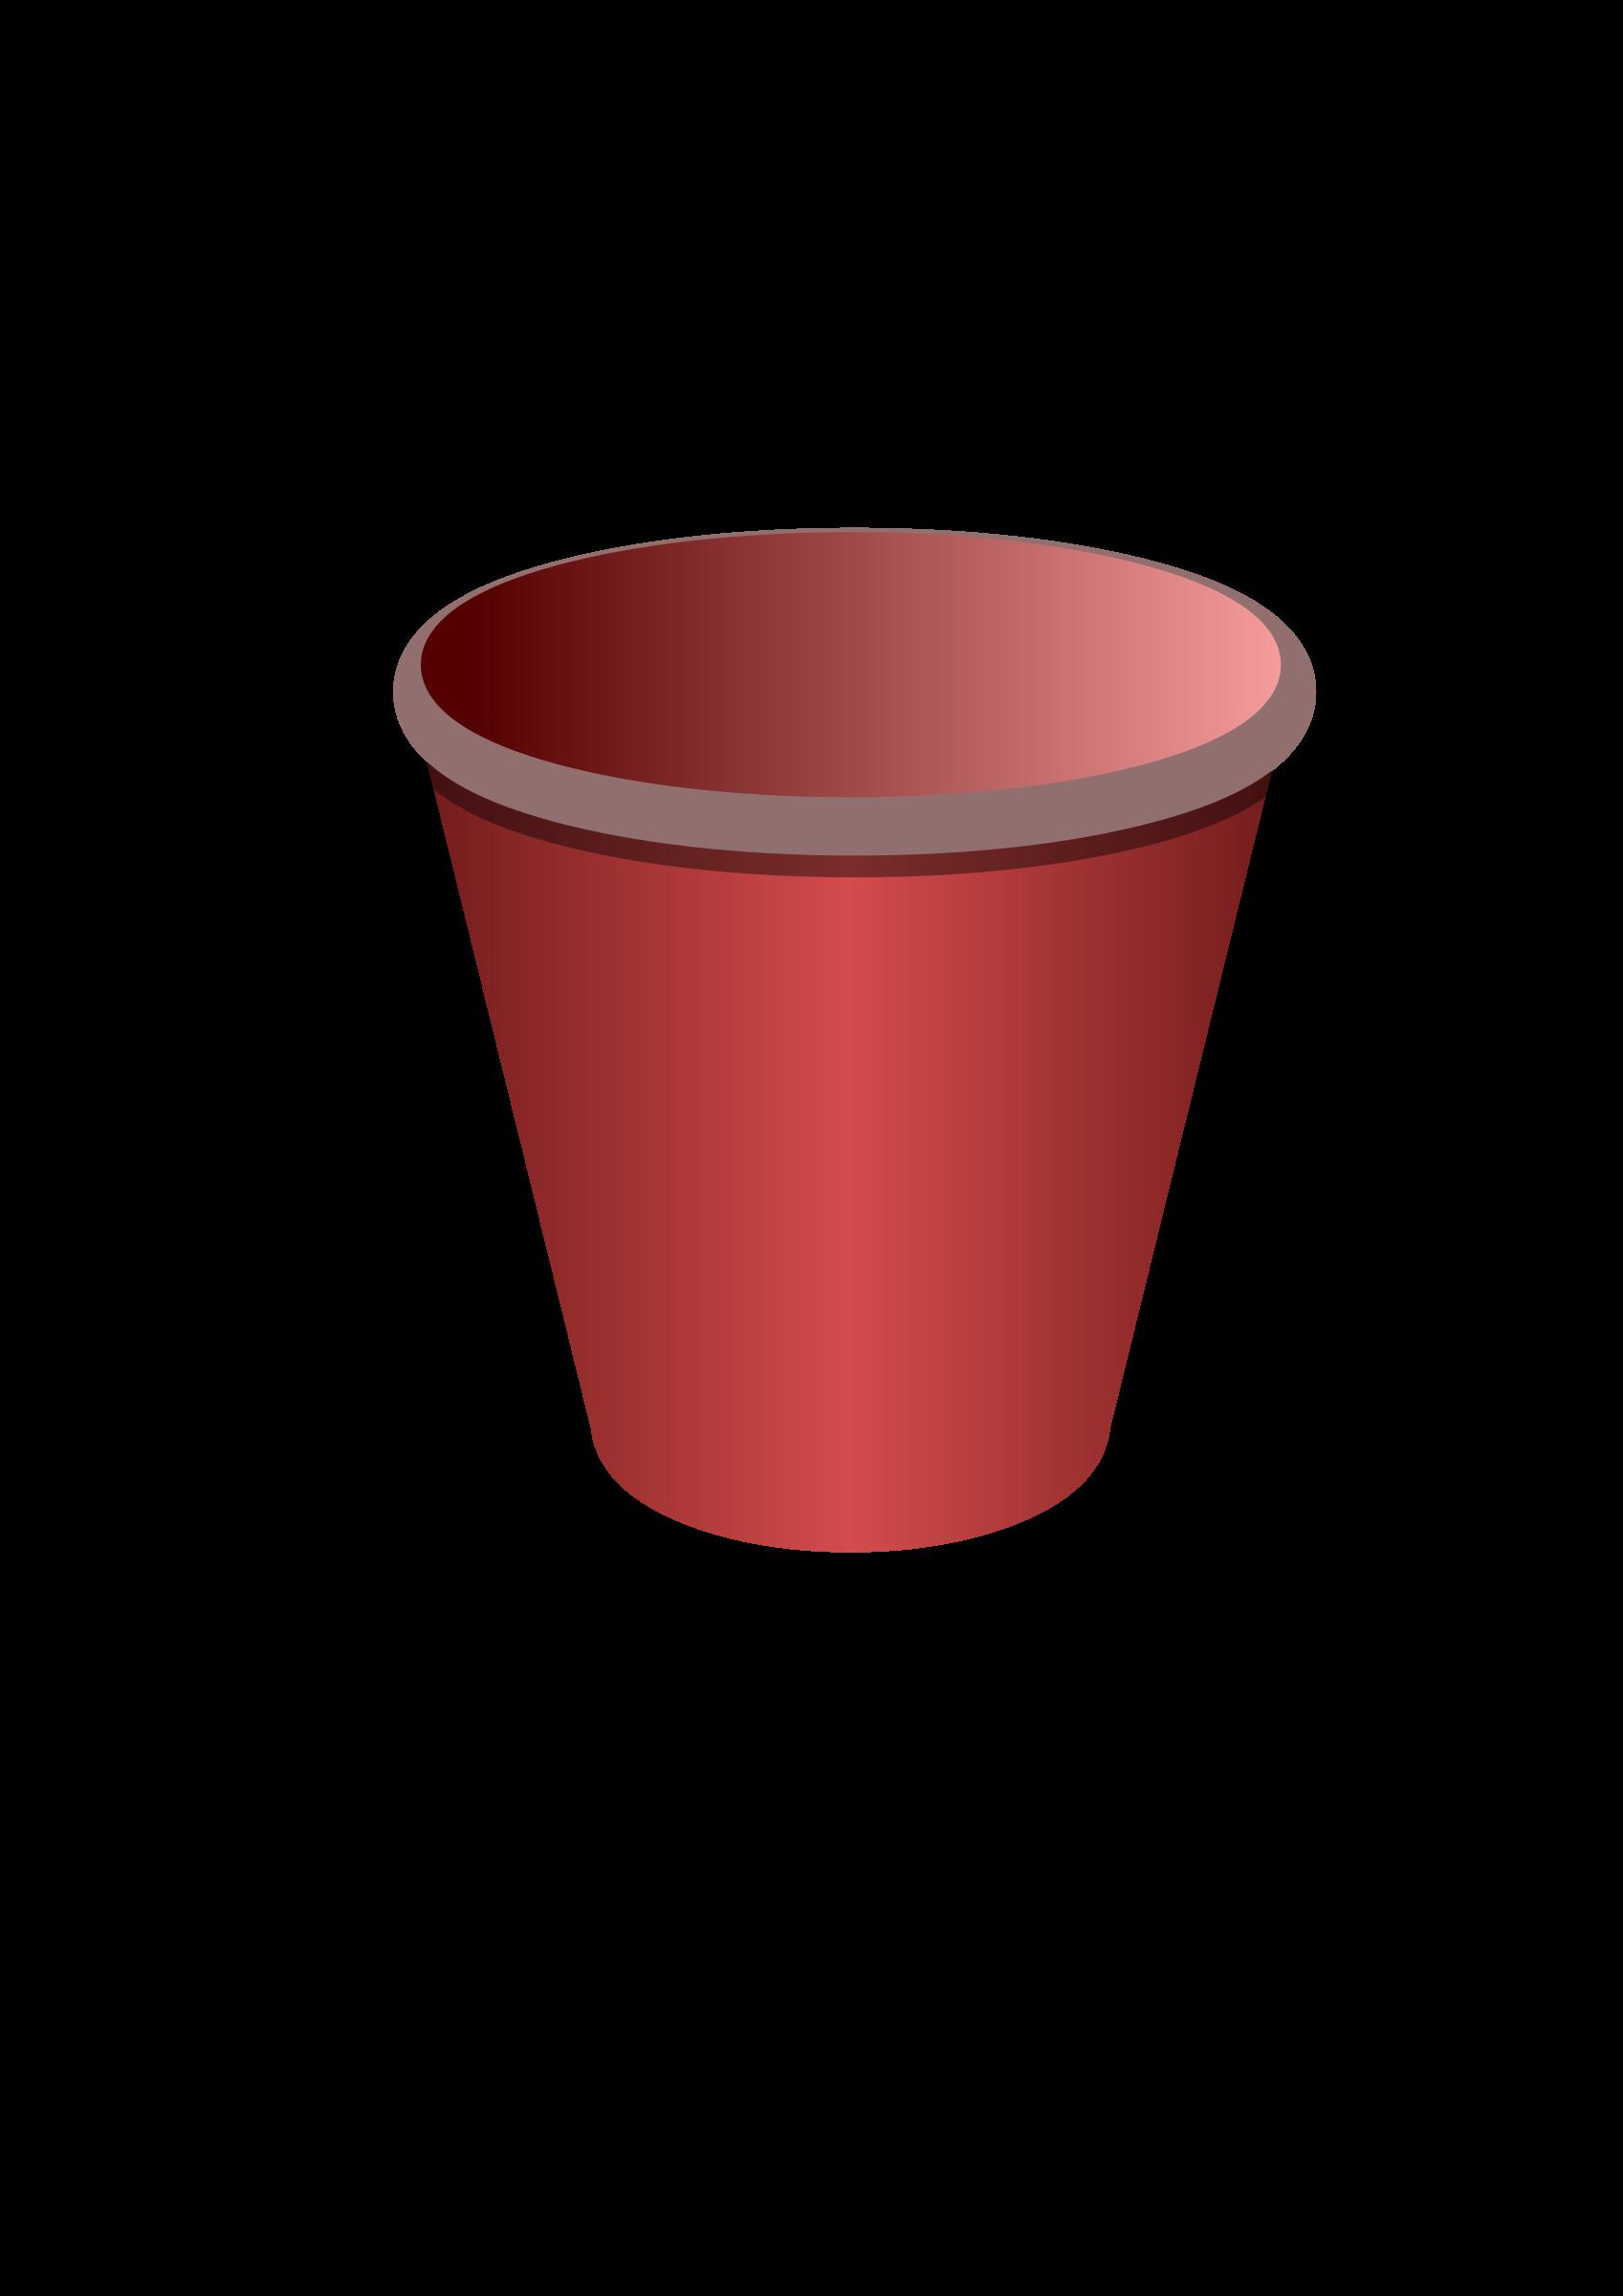 Clipart - bucket